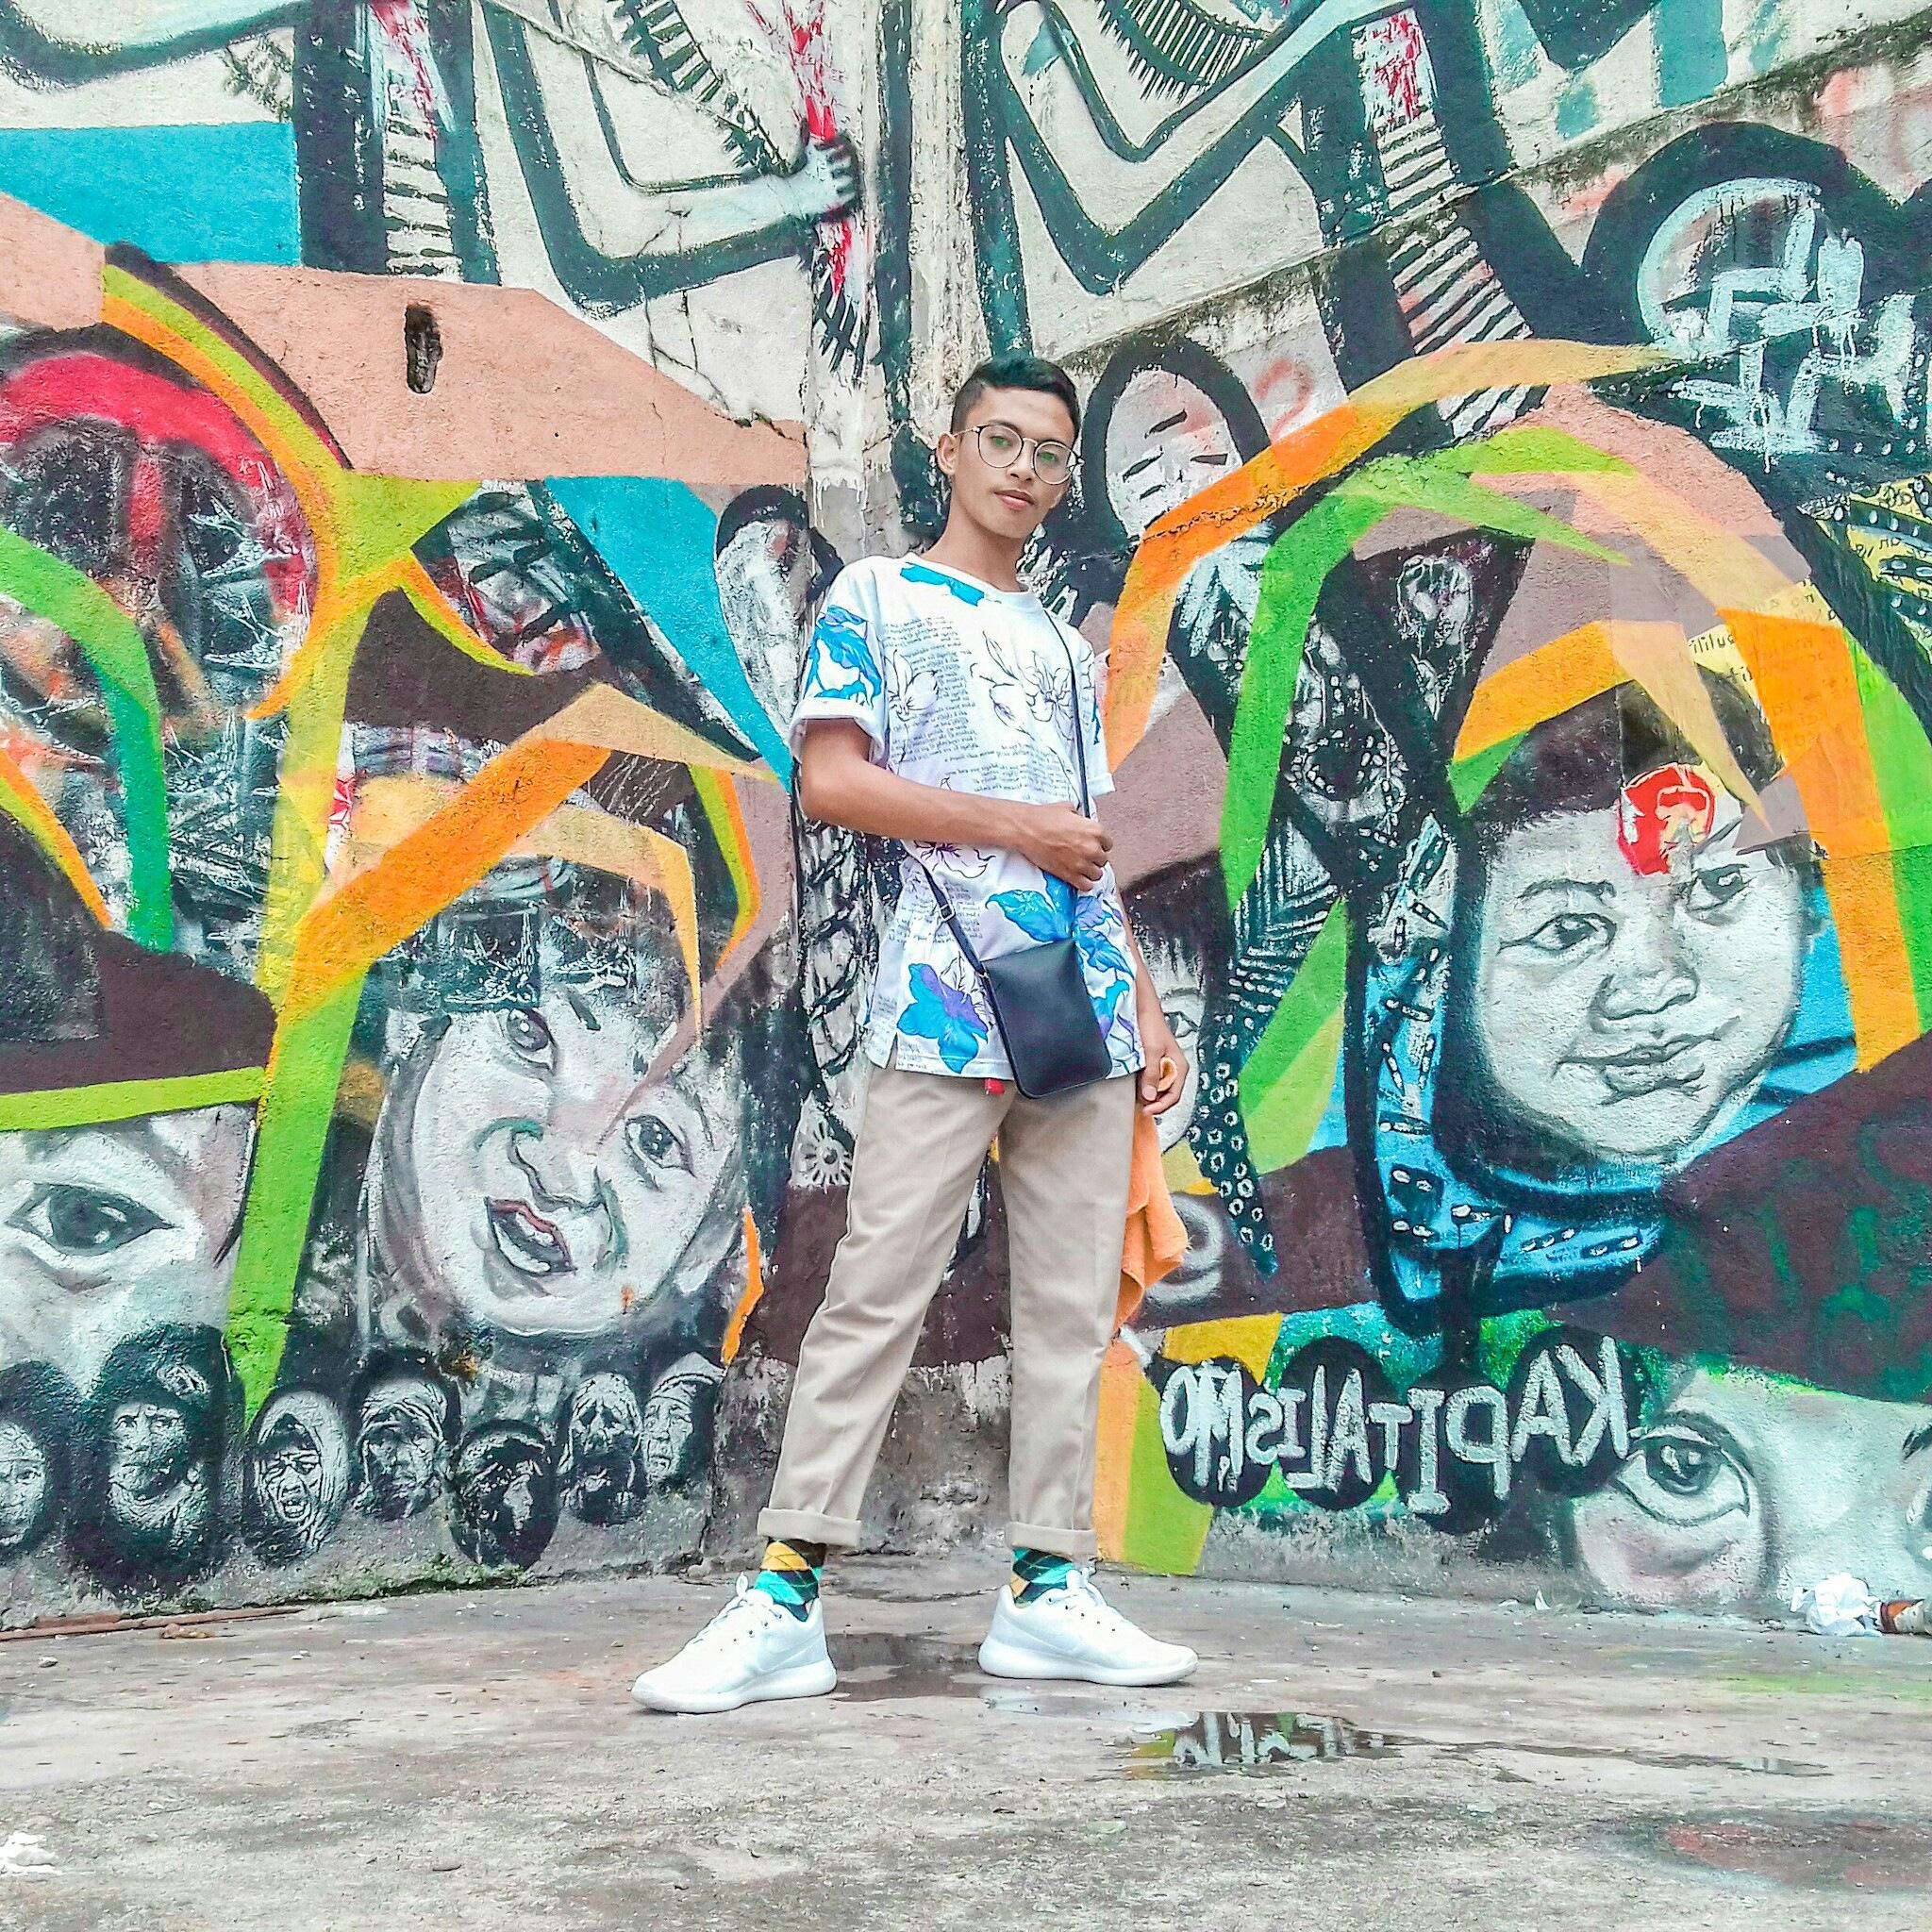 graffiti art background by Bryan Lenard Alipio